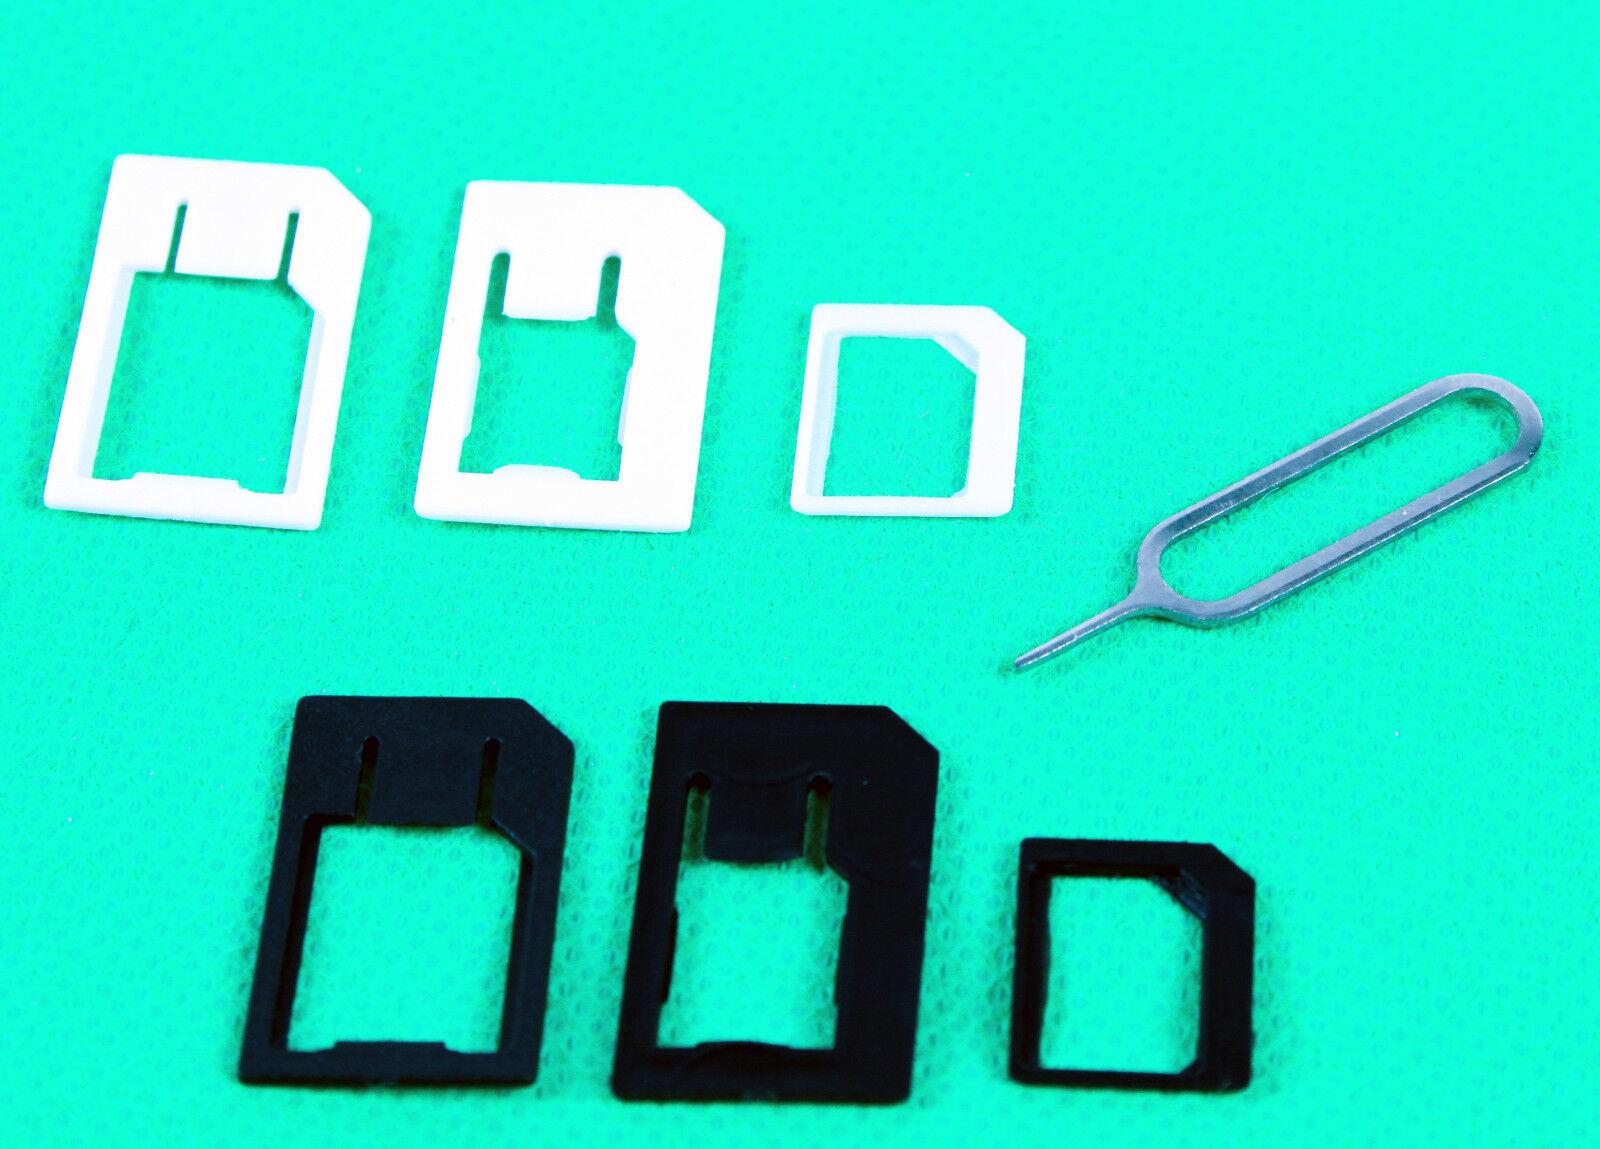 nano micro kartenadapter sim karte adapter kartenleser. Black Bedroom Furniture Sets. Home Design Ideas